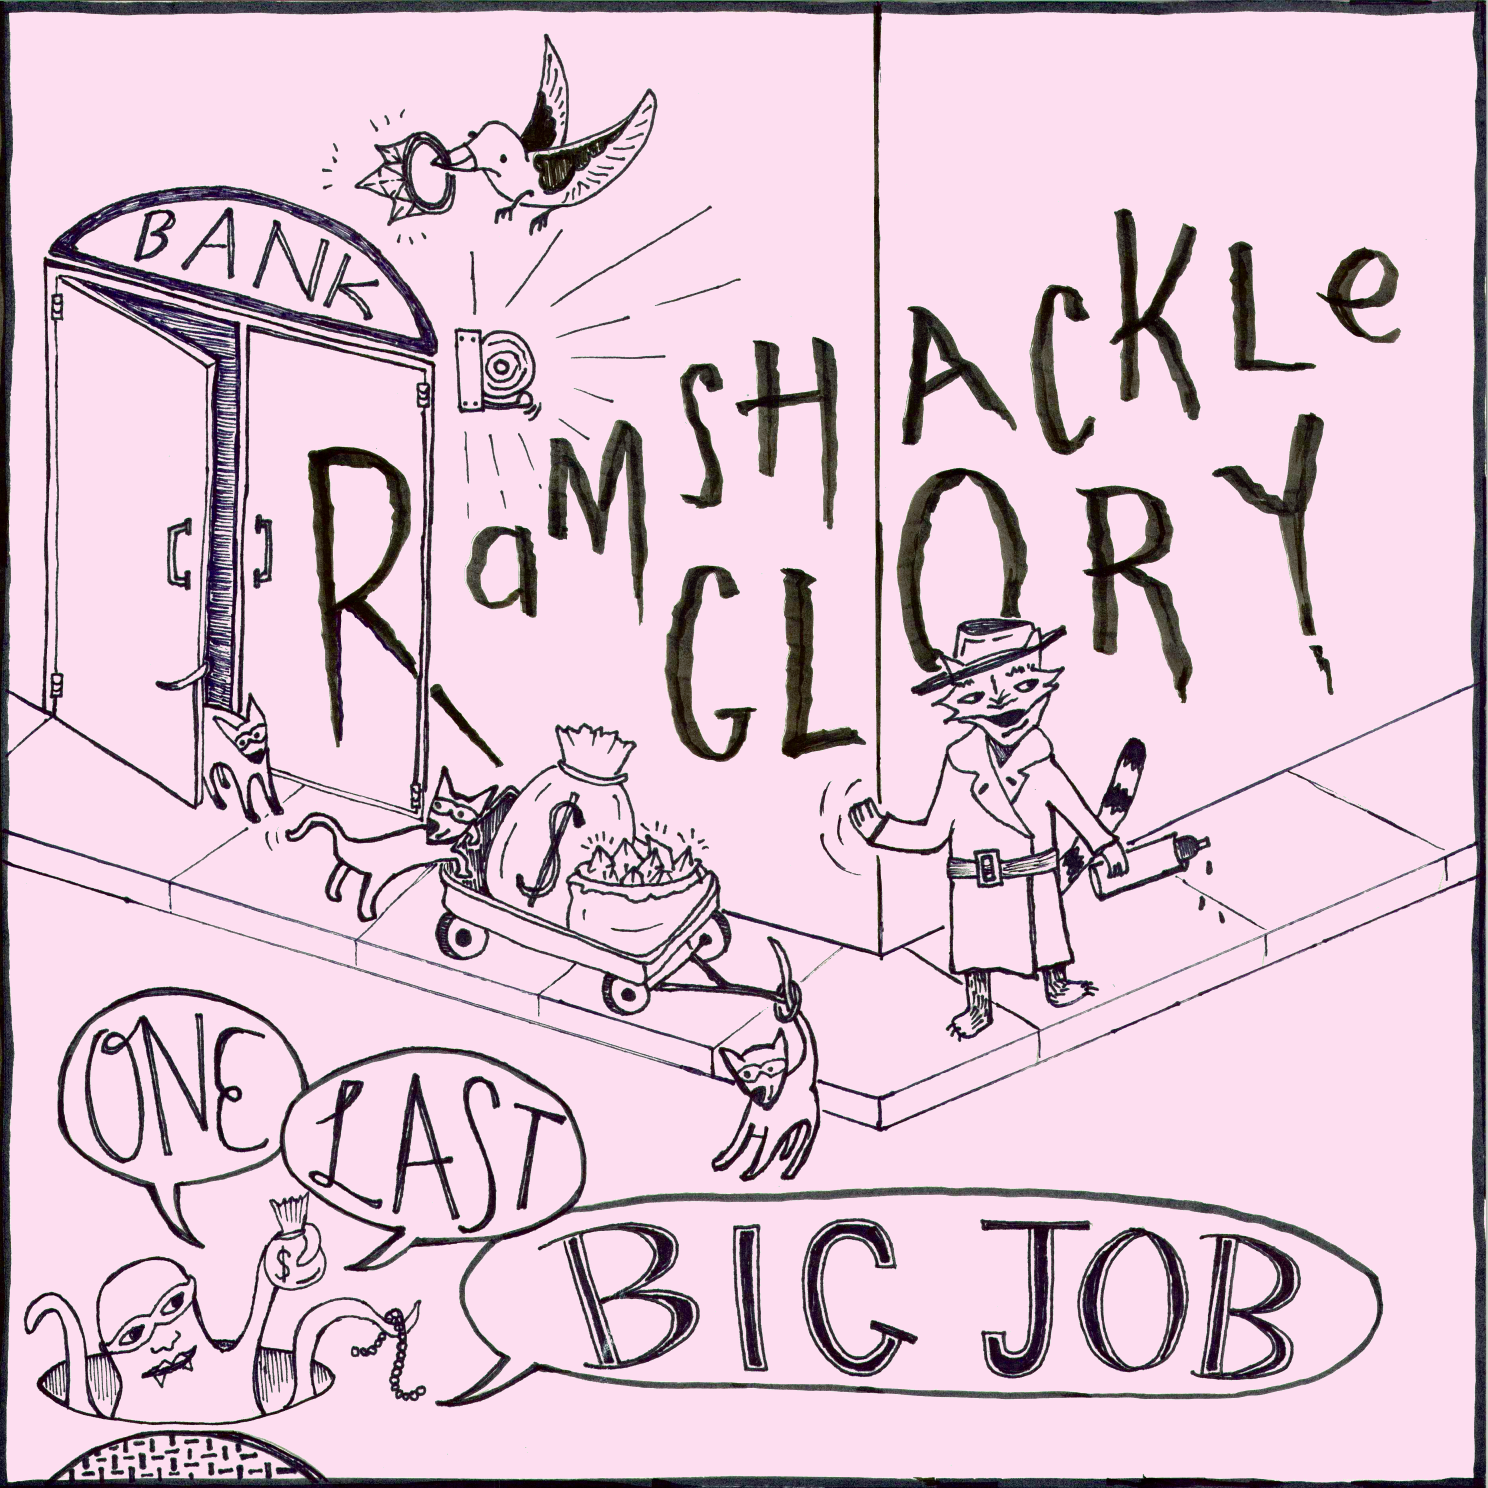 one-last-big-job-album-review